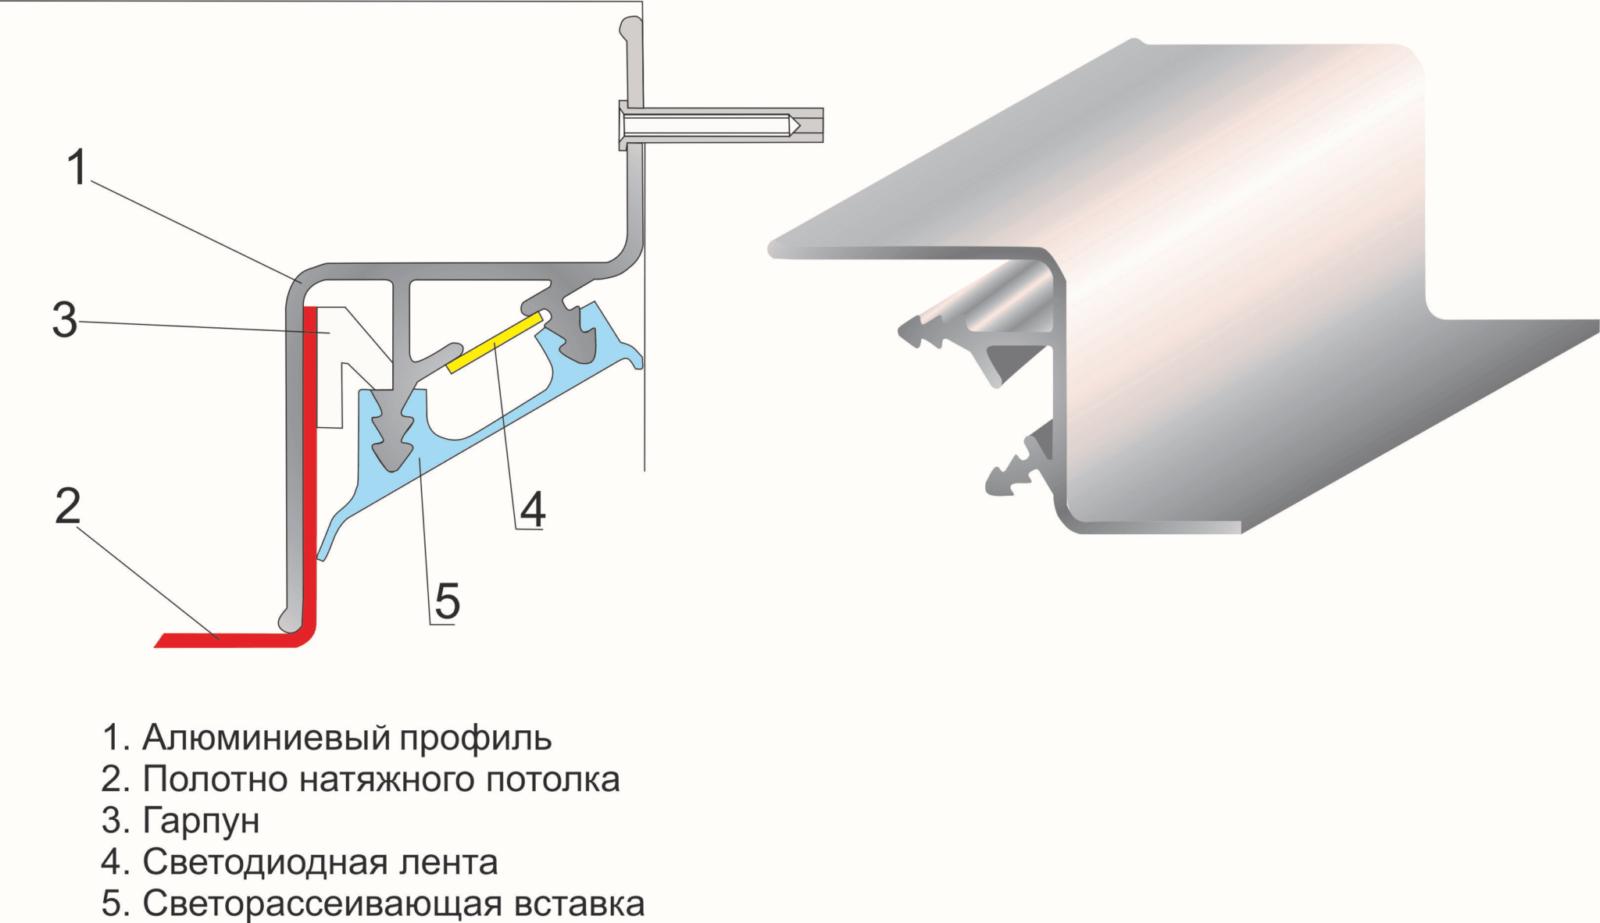 Профиль АП-950